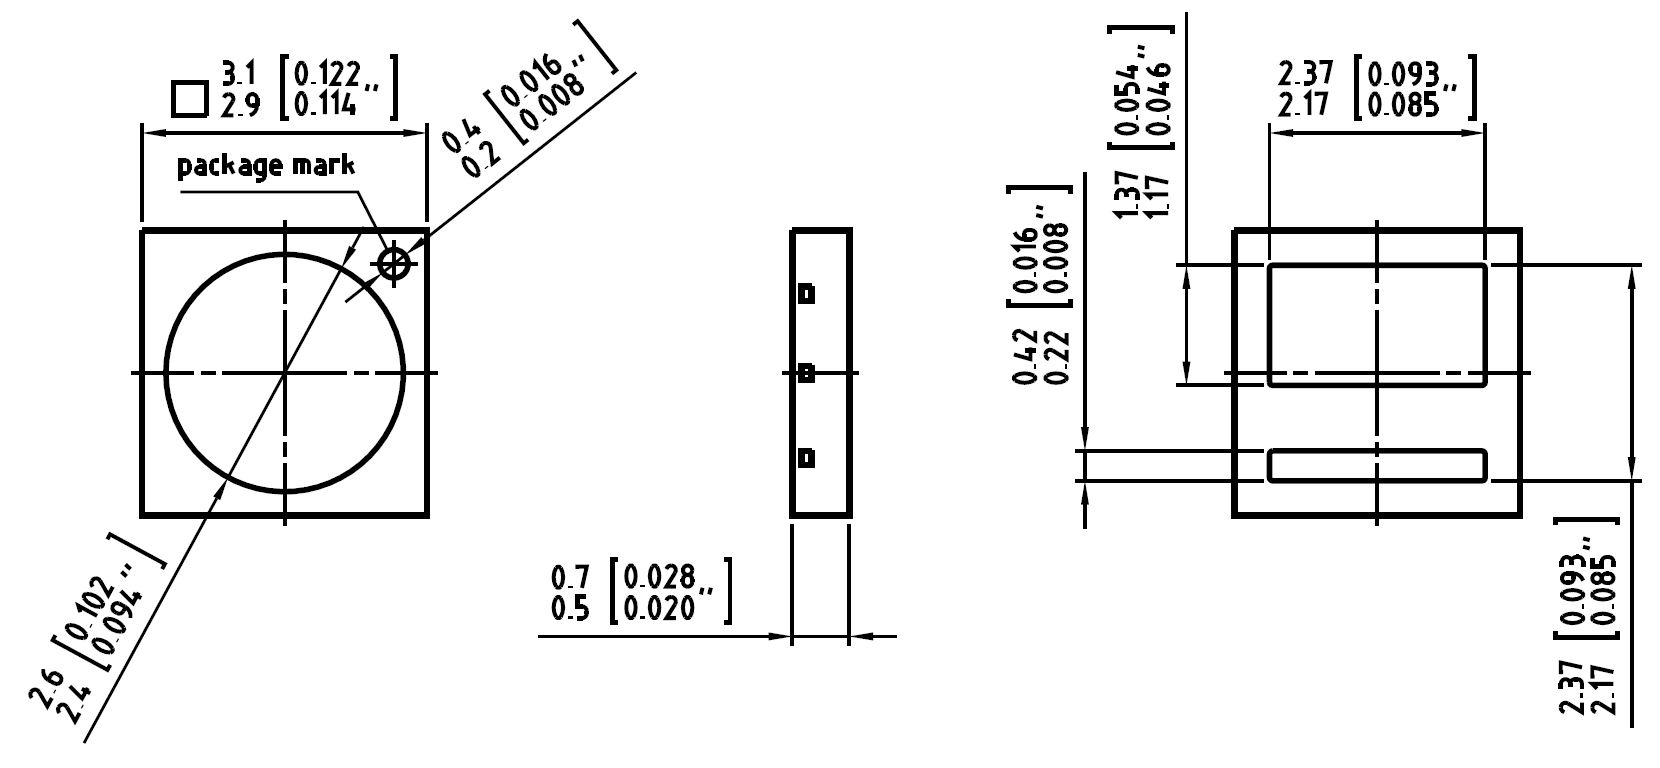 50 pieces OSRAM DURIS® S5 LED 2700K WARM WHITE CRI 82  ~1.0W  3030  GW PSLPS1.EC